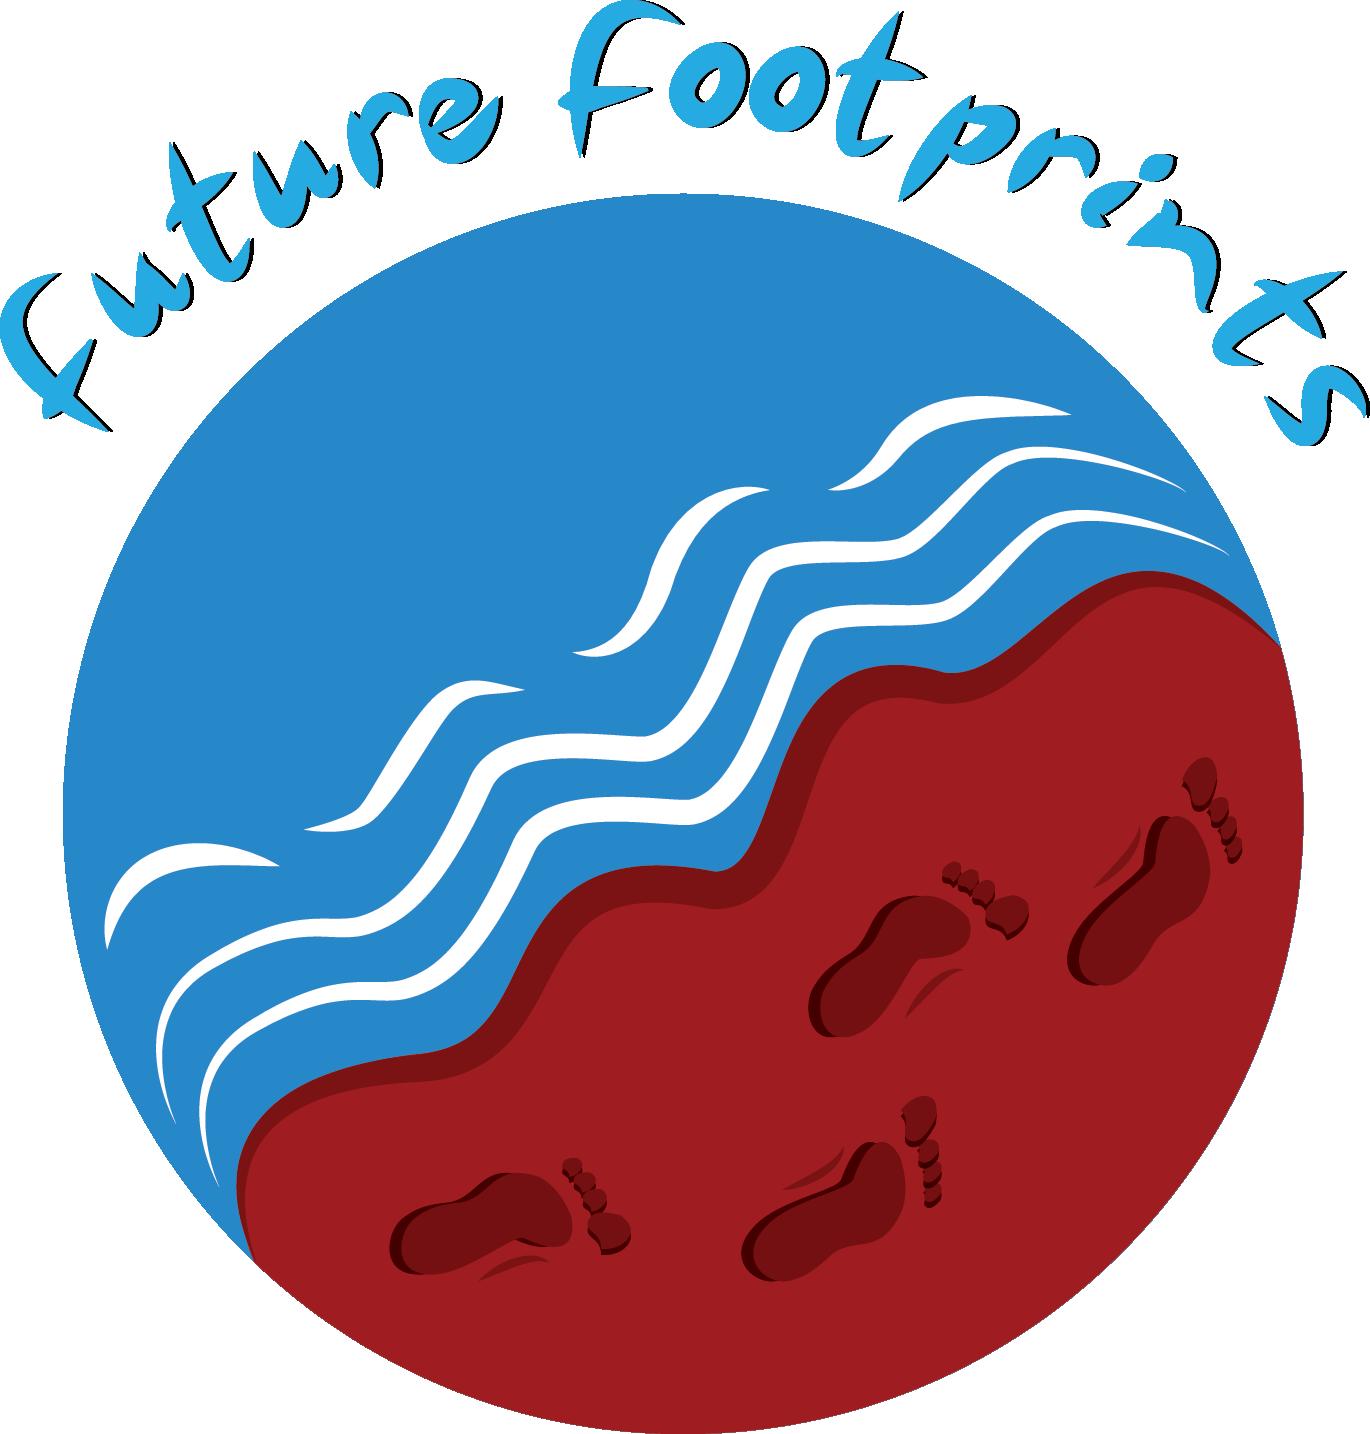 Knowledge clipart school culture. Future footprints program aiswa